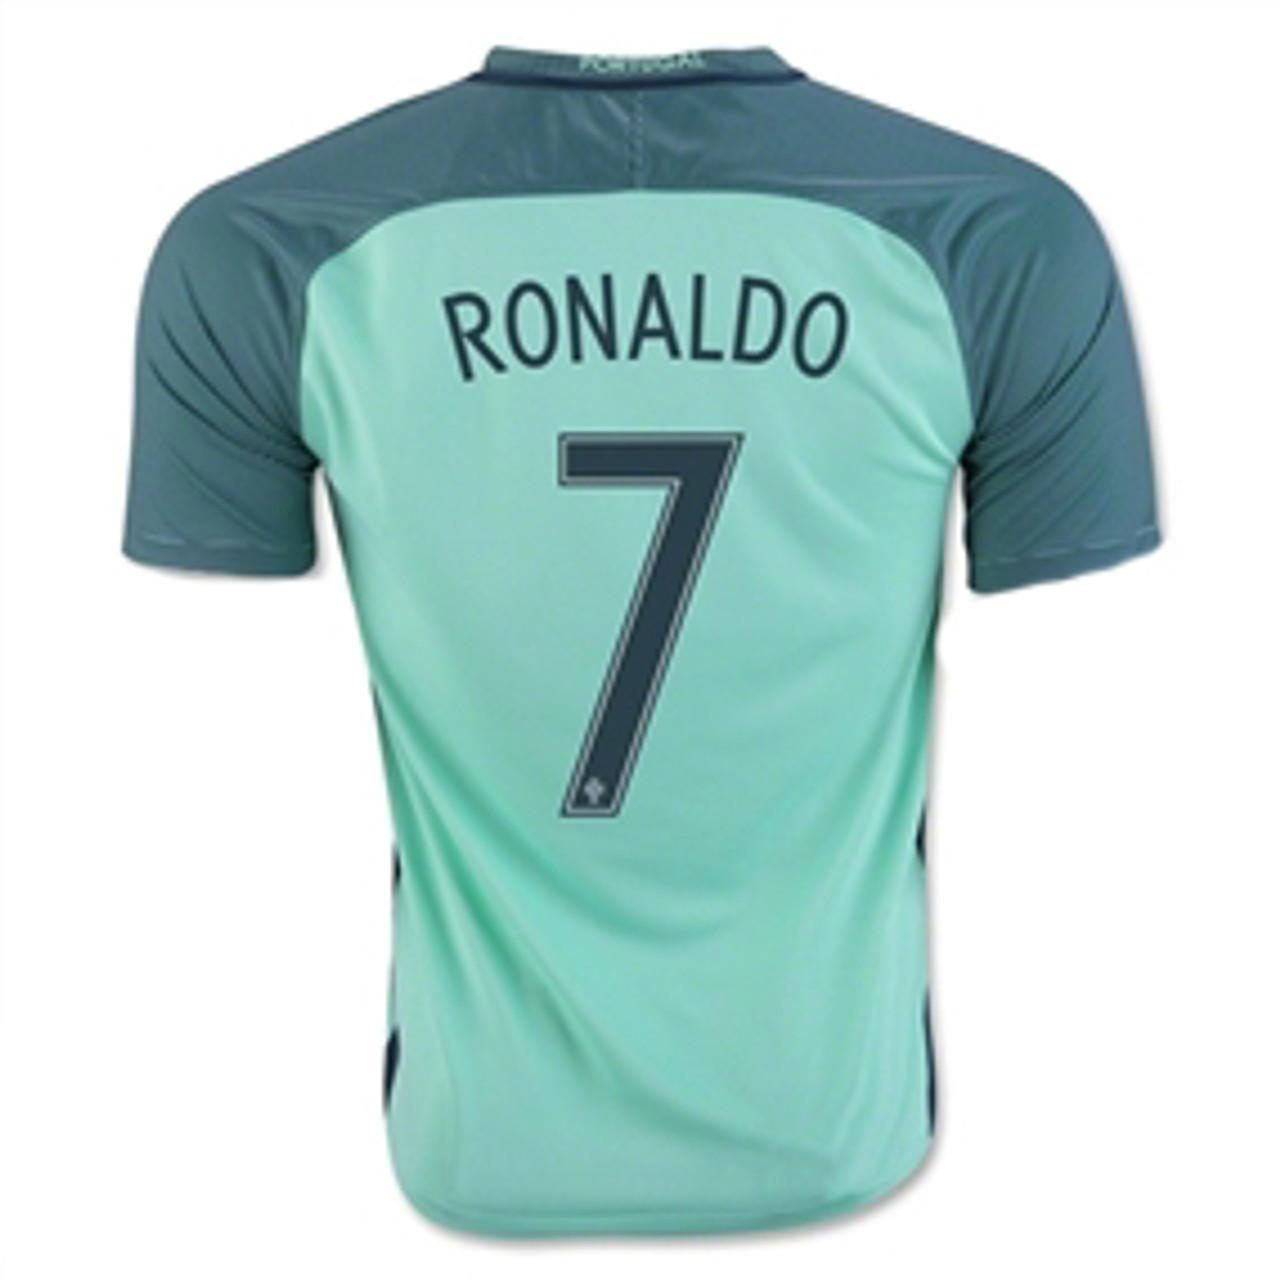 new style b5459 f2b28 NIKE PORTUGAL 2016 BOYS AWAY `RONALDO` JERSEY green